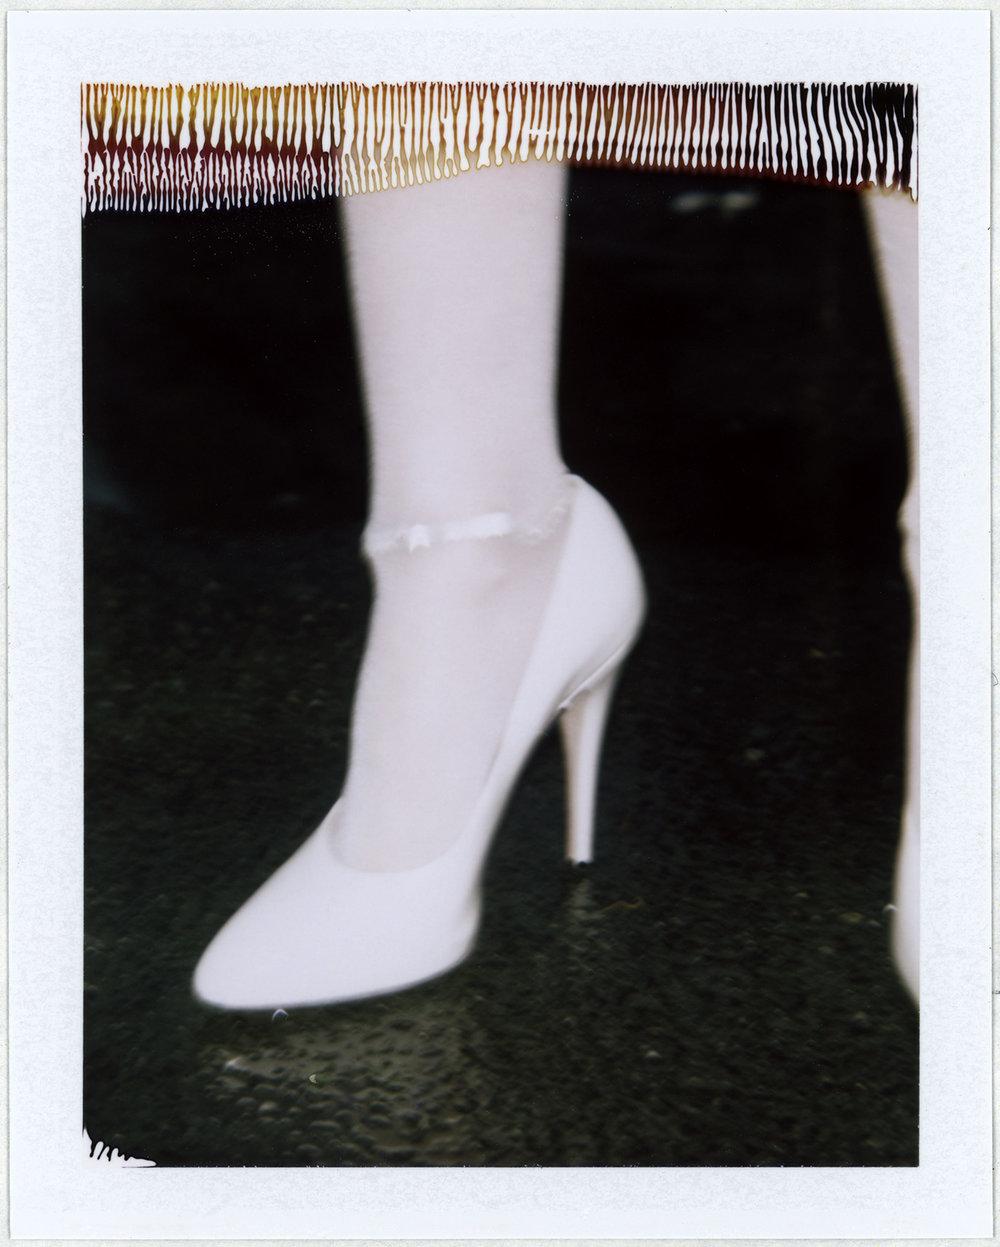 Zapato de GUCCI y brazalete de GIANVITO ROSSI